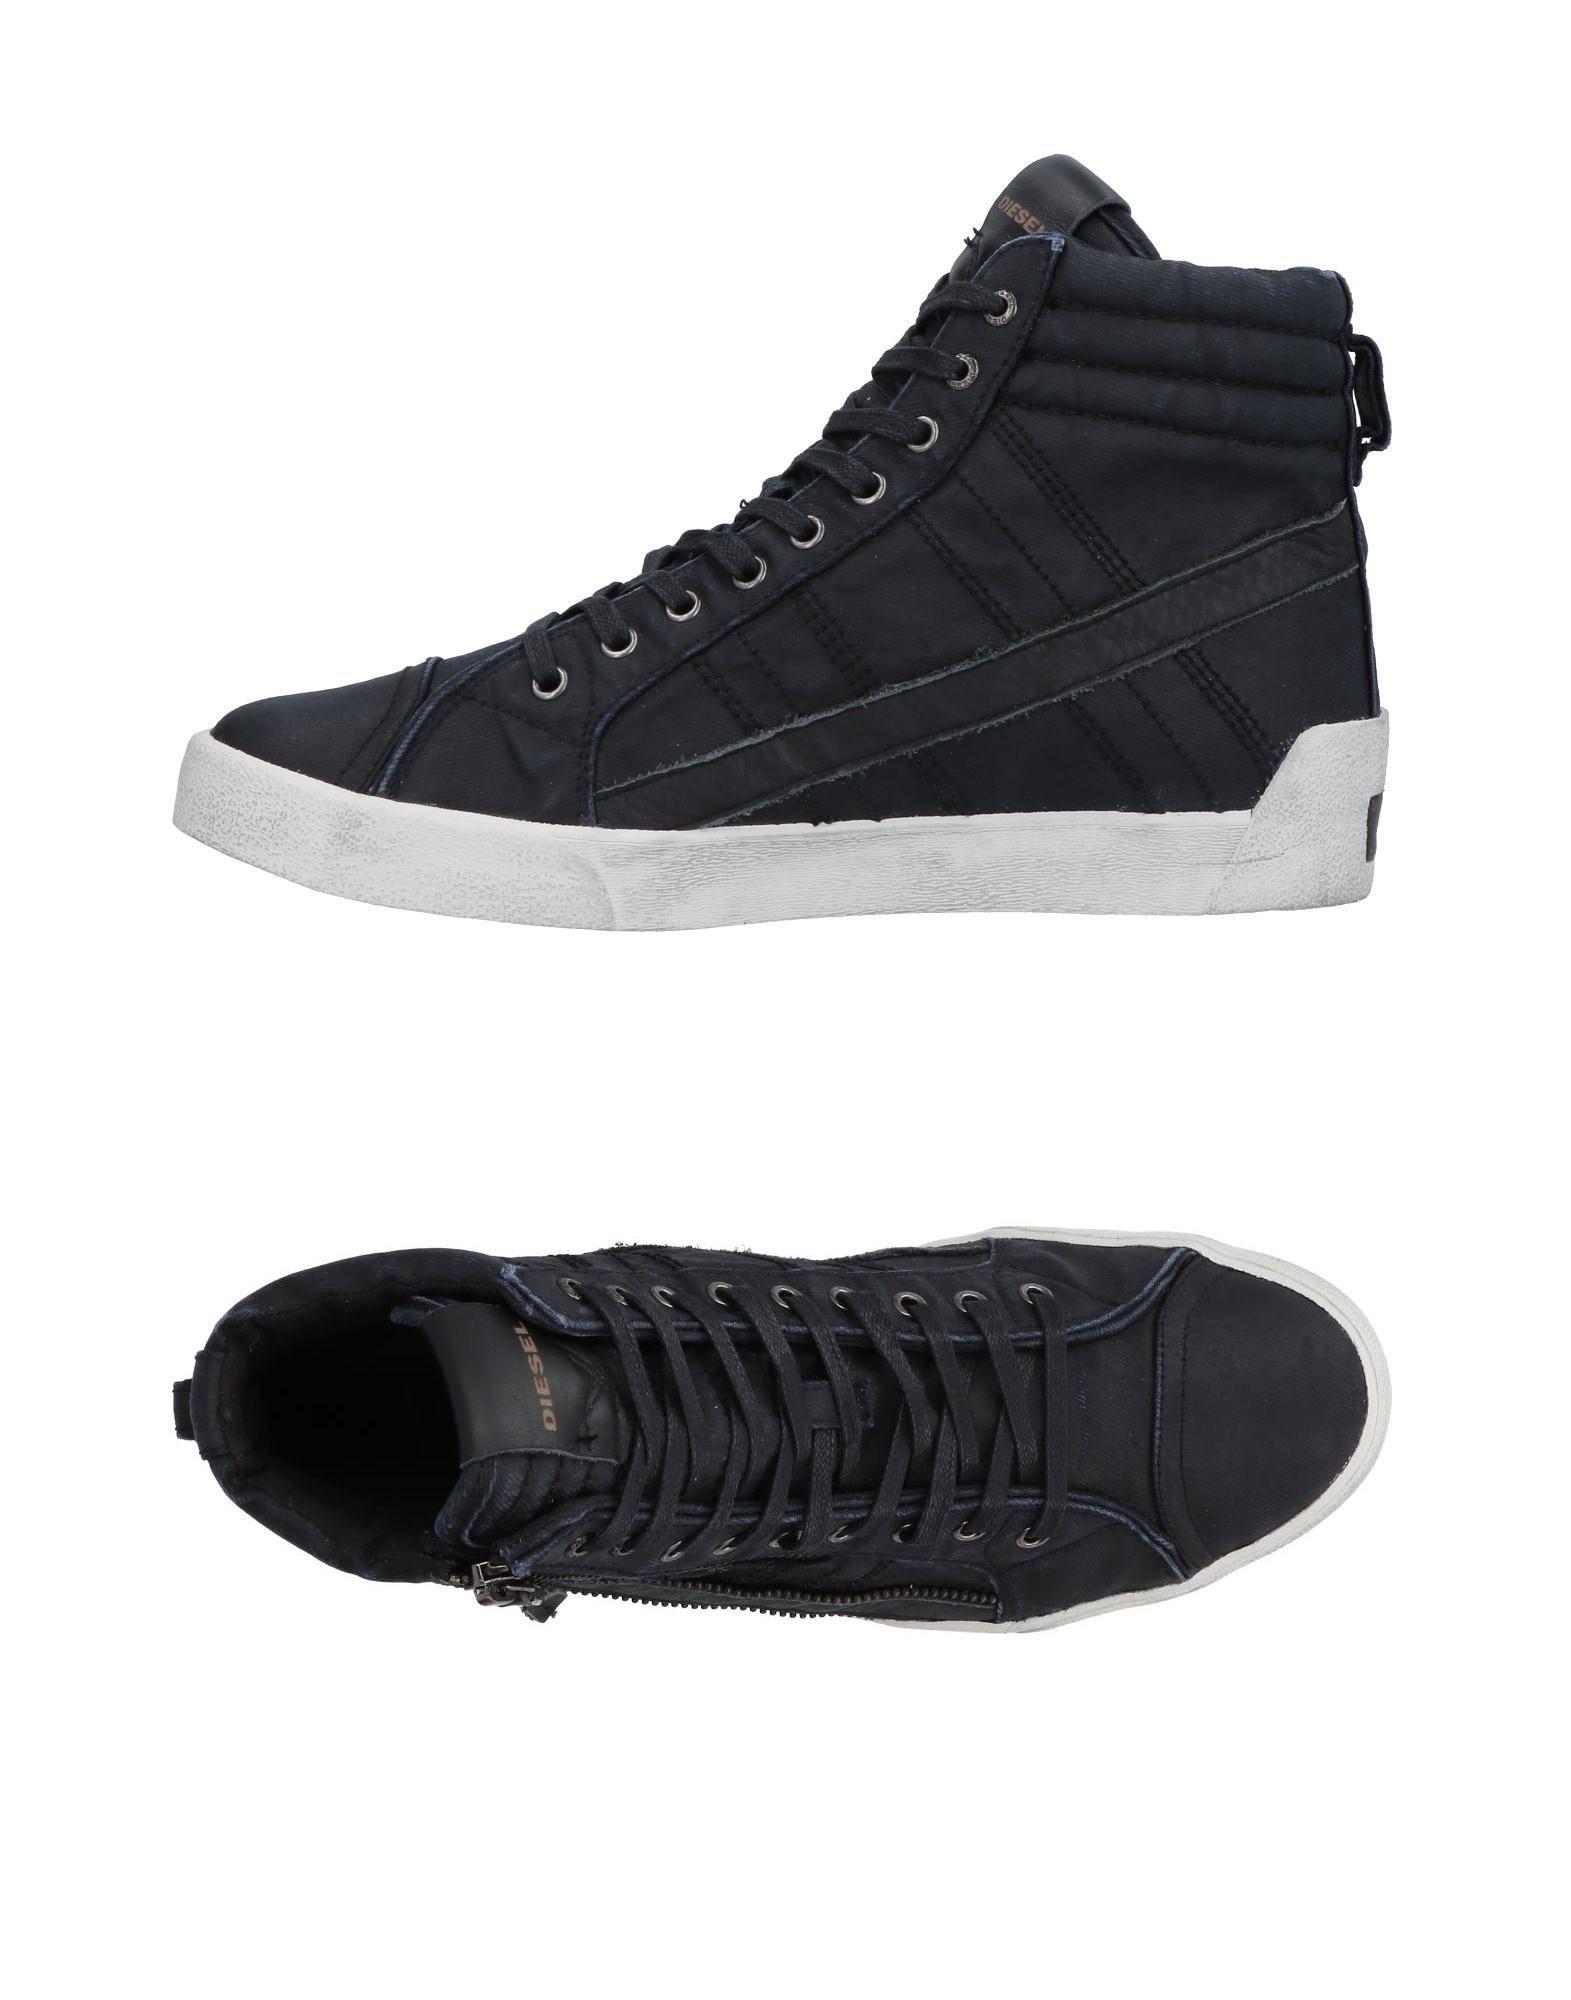 Moda Sneakers Diesel Uomo Uomo Diesel - 11491160BC 17e6a7